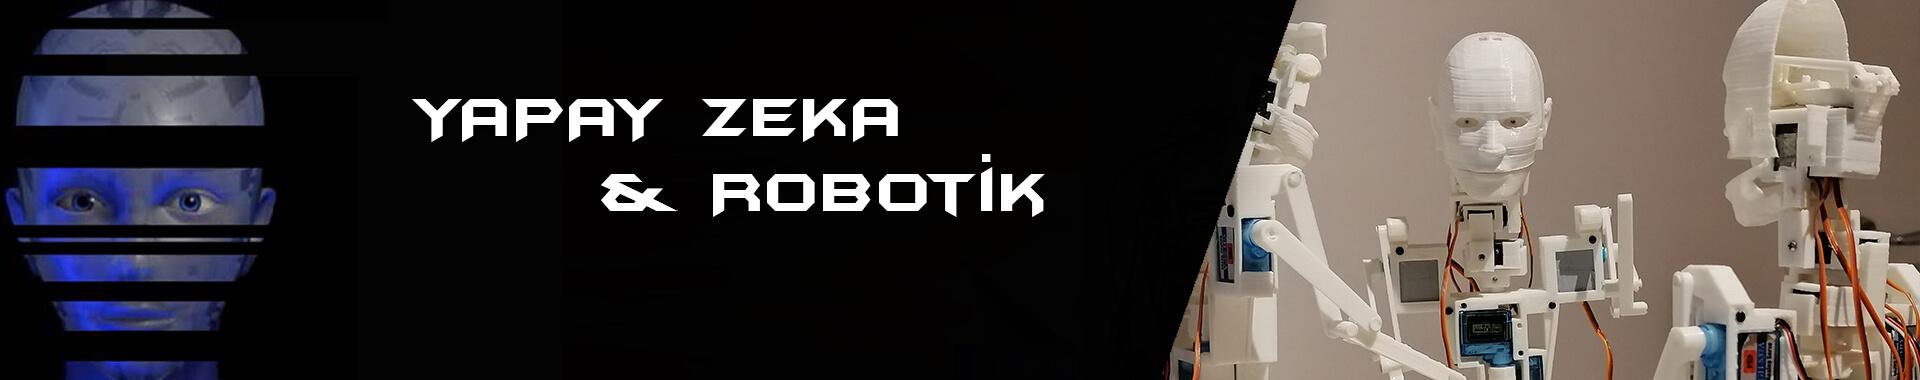 slide-robotics-2-tr